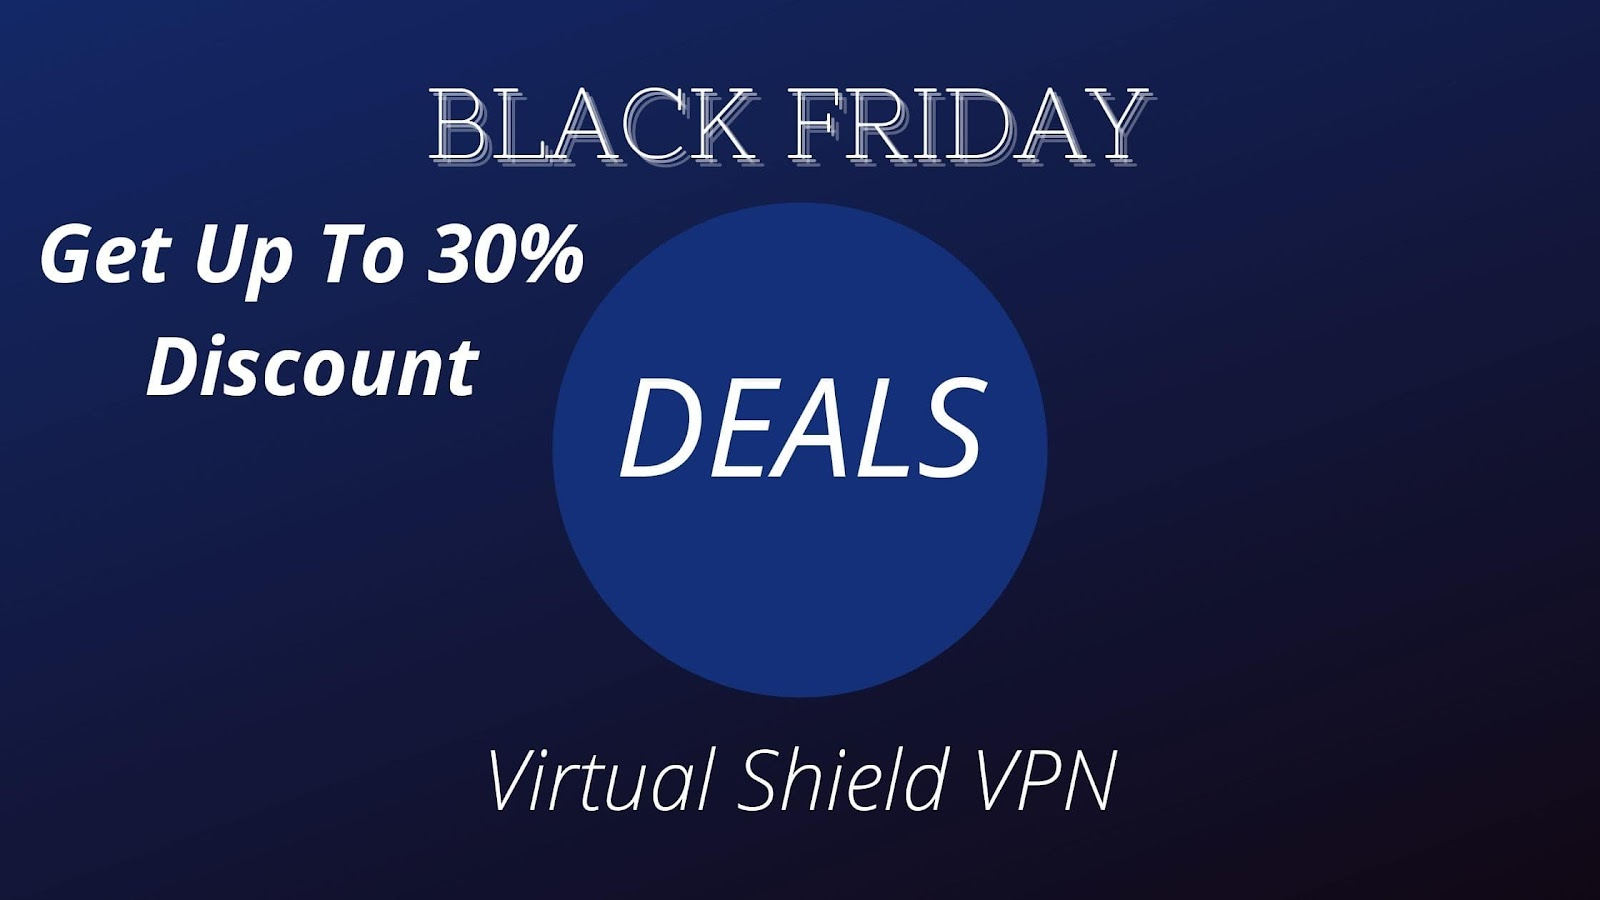 Virtual Shield VPN - 30% Discount